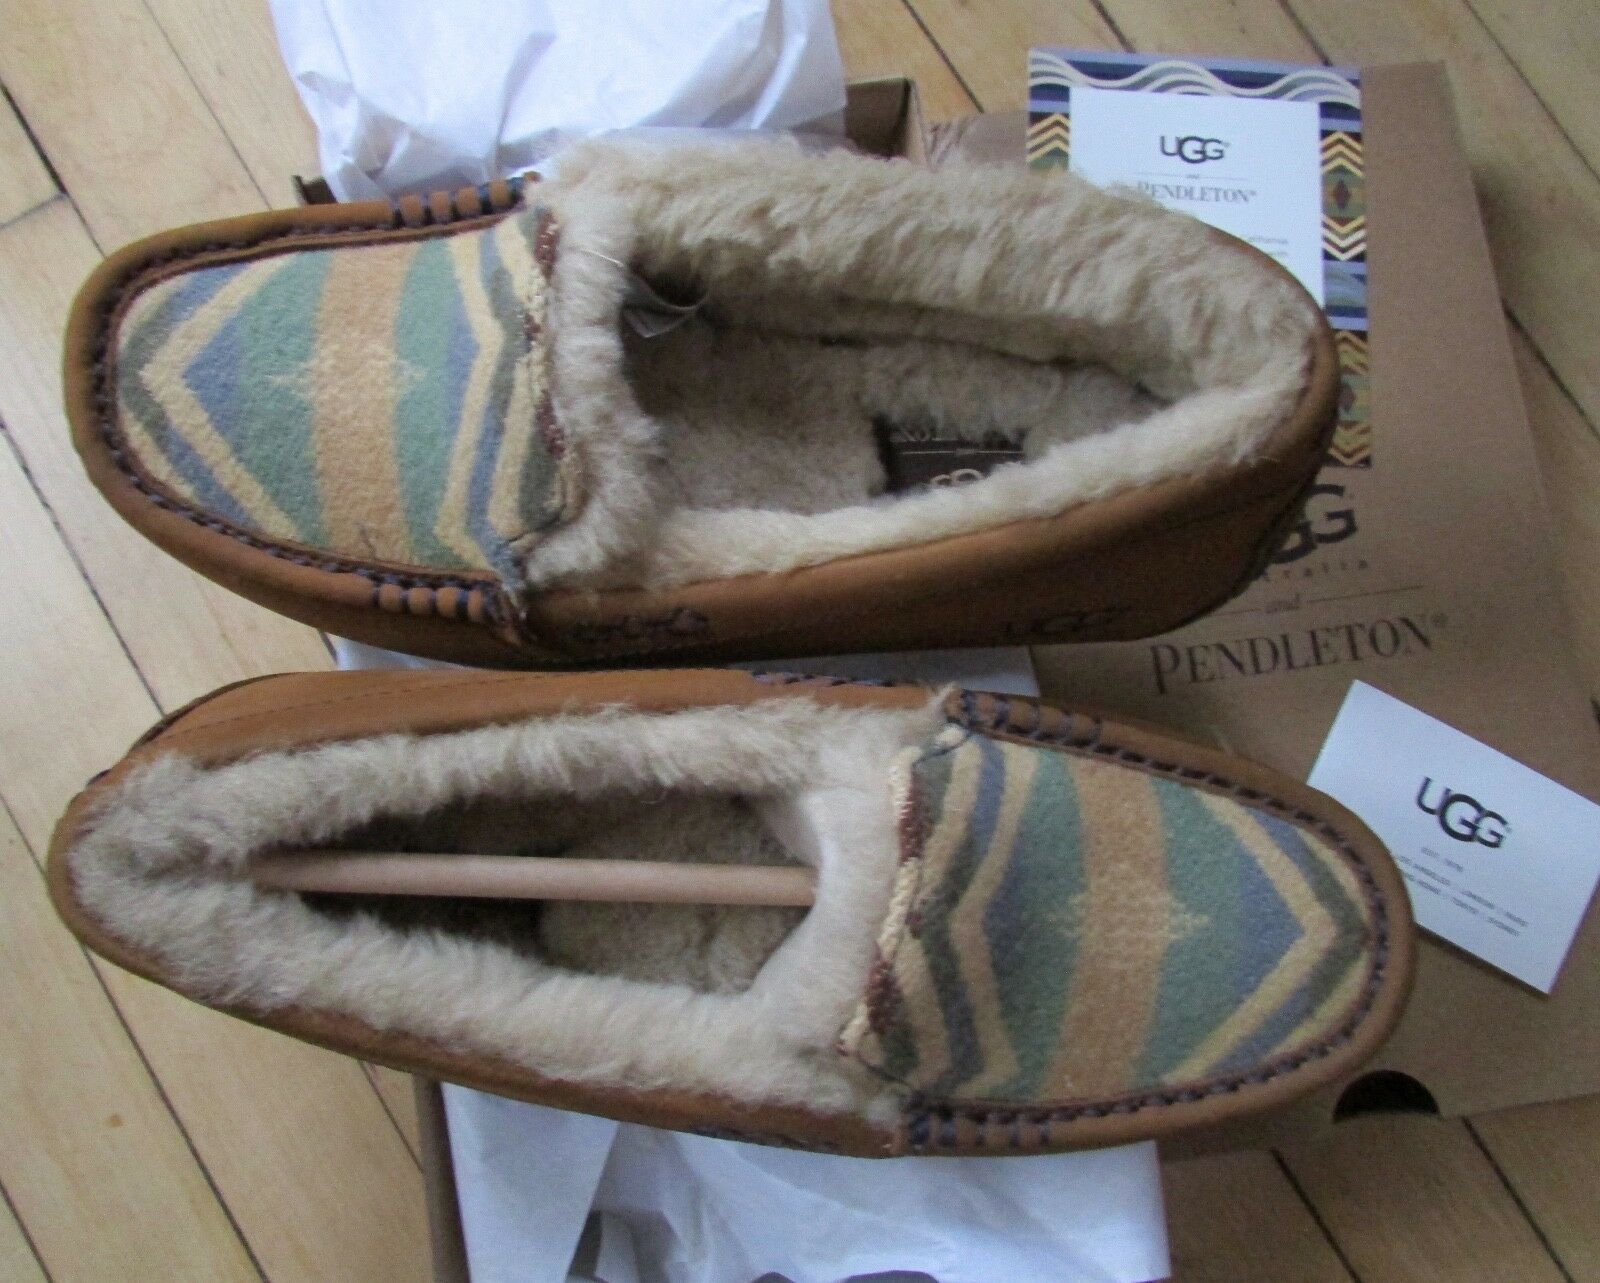 UGG Slipper Shoes Pendleton Ansley Loafer Convient à La Taille 6.5-7 NEUVE 140 $